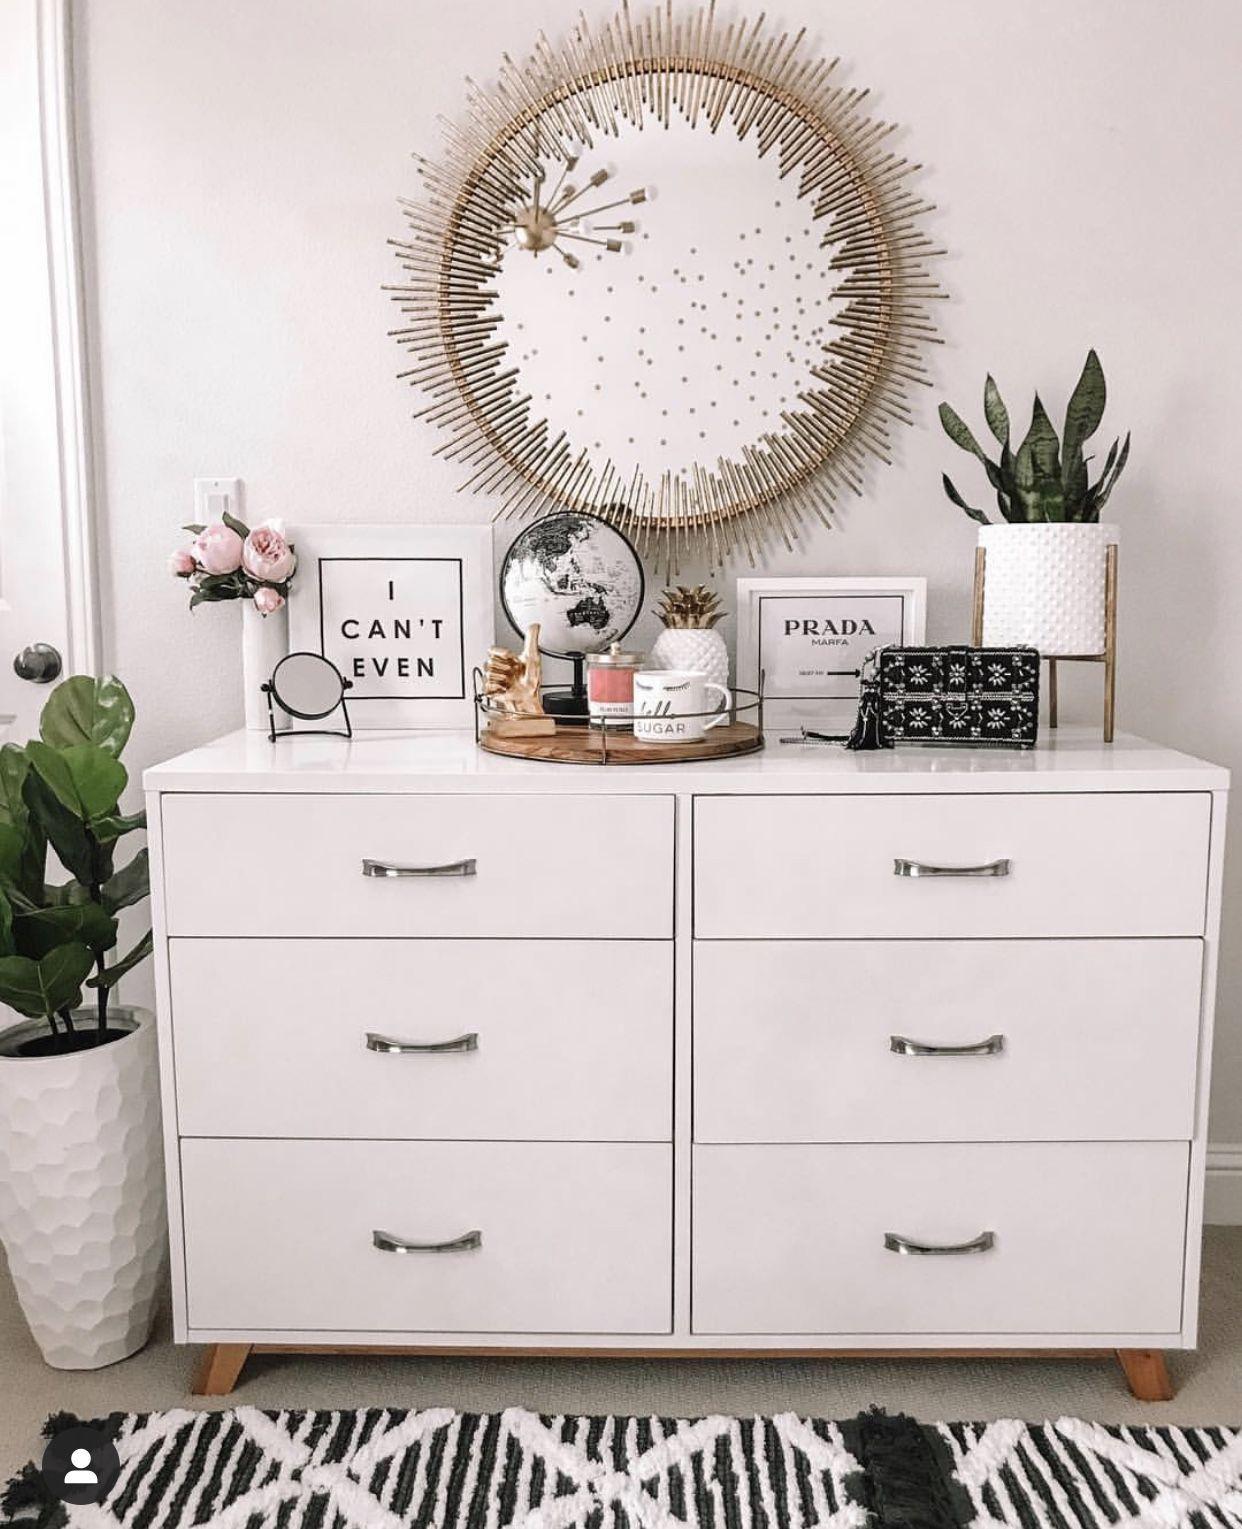 Home Decor Kmart In 2020 Dresser Decor Bedroom Bedroom Decor Home Decor